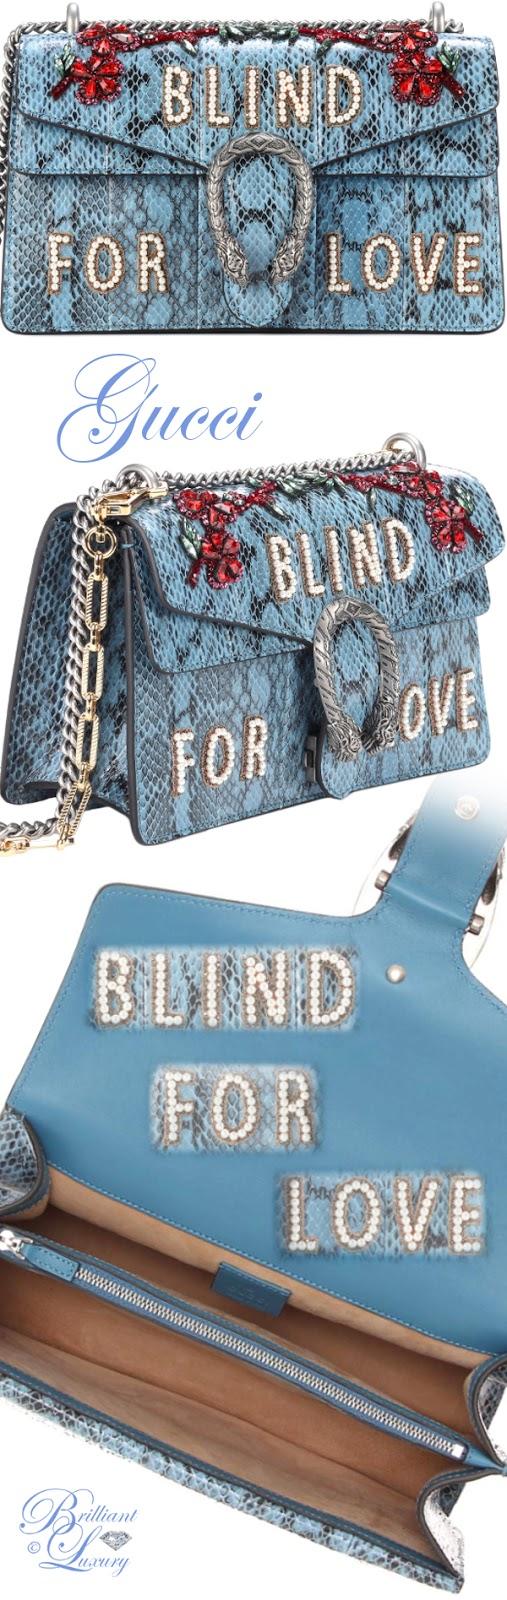 Brilliant Luxury ♦ Gucci Dionysus medium snakeskin shoulder bag